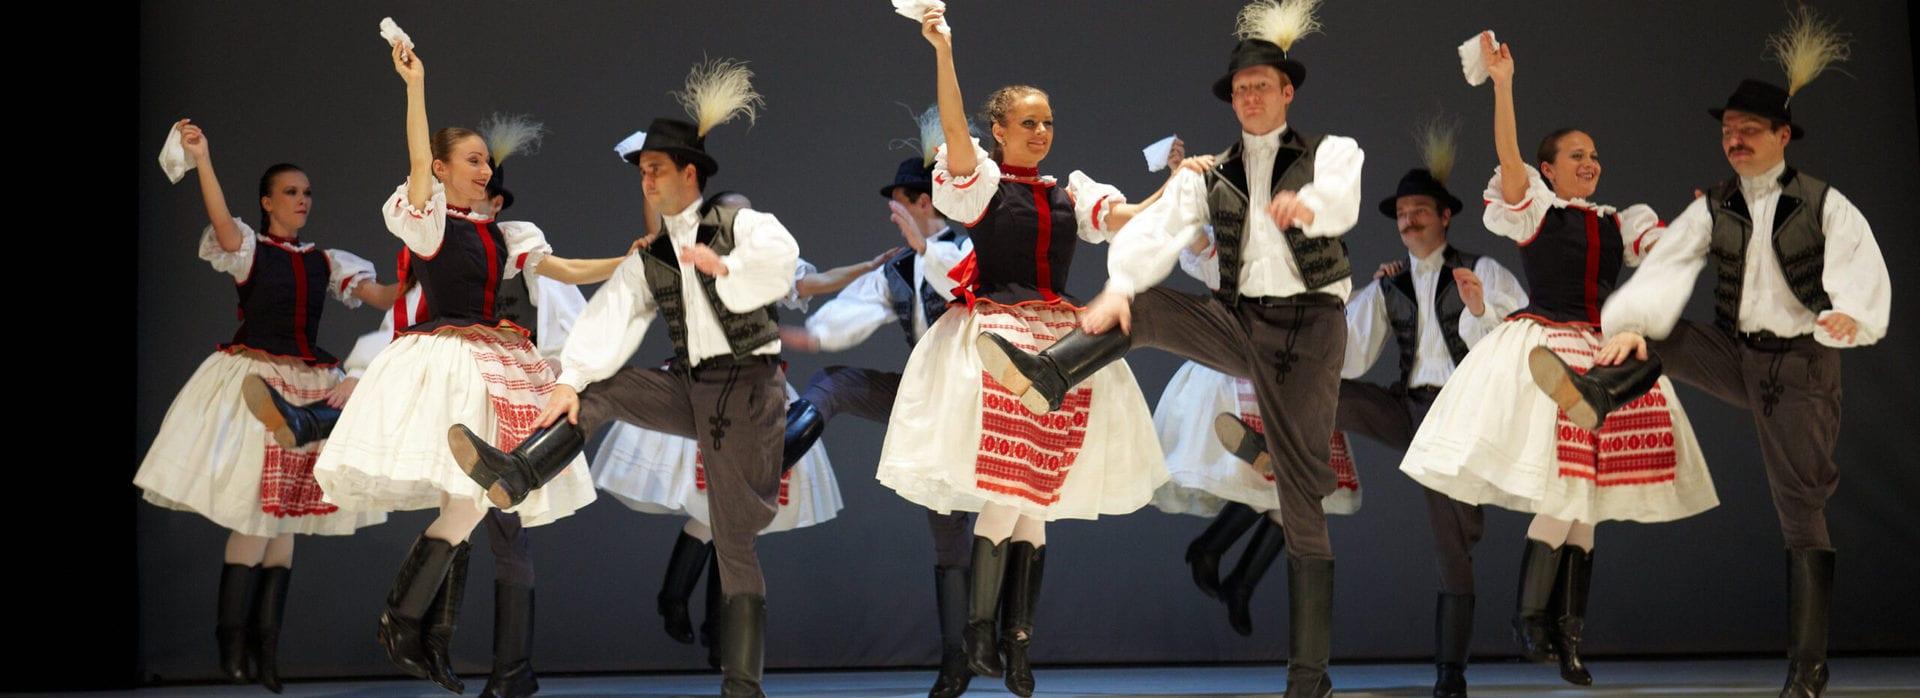 Studietur Budapest Folklore